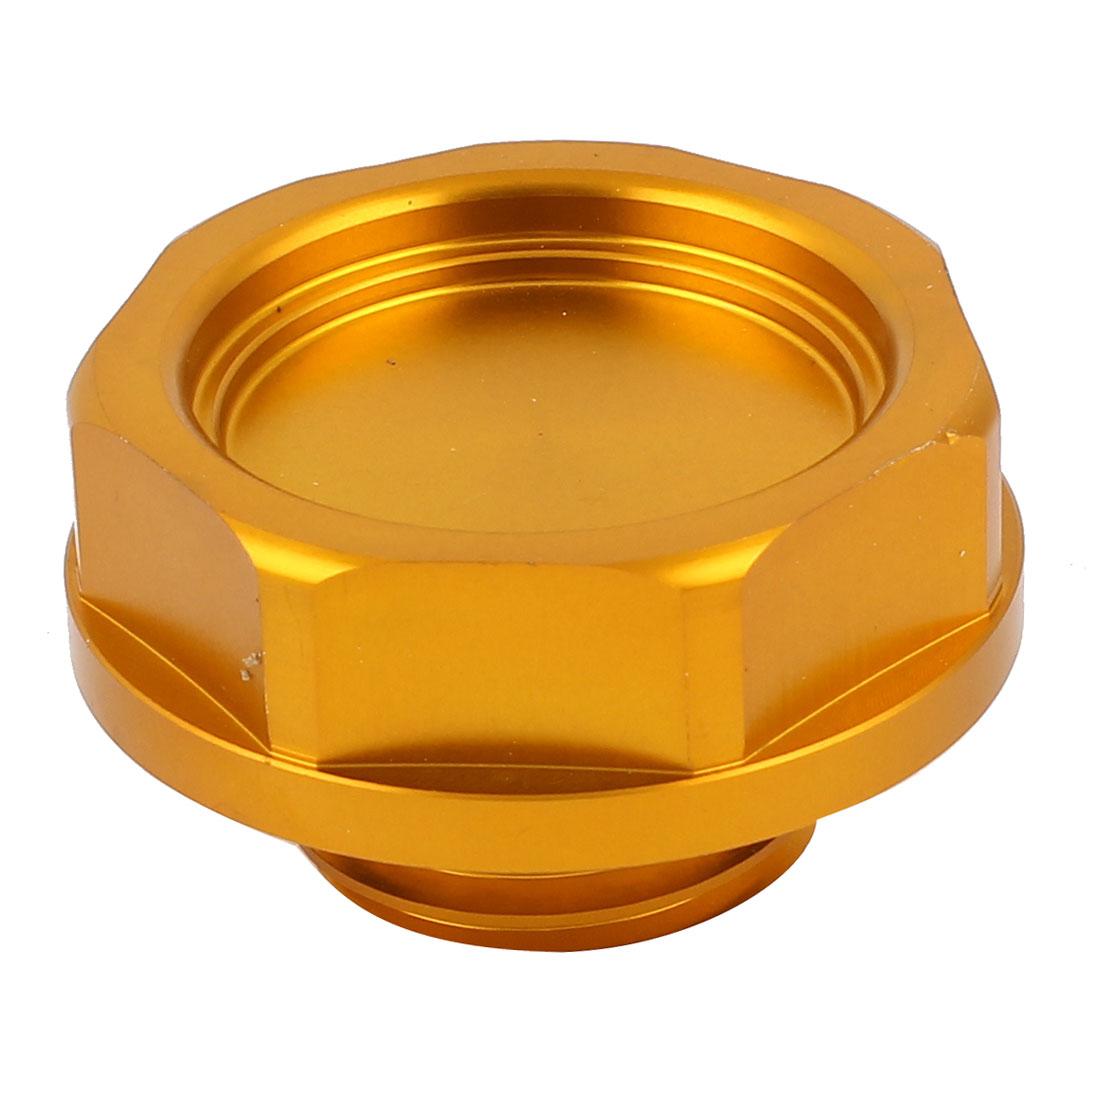 Vehicle Car Orange Metal Engine Oil Filler Fuel Cover Cap 56mm Dia for Honda